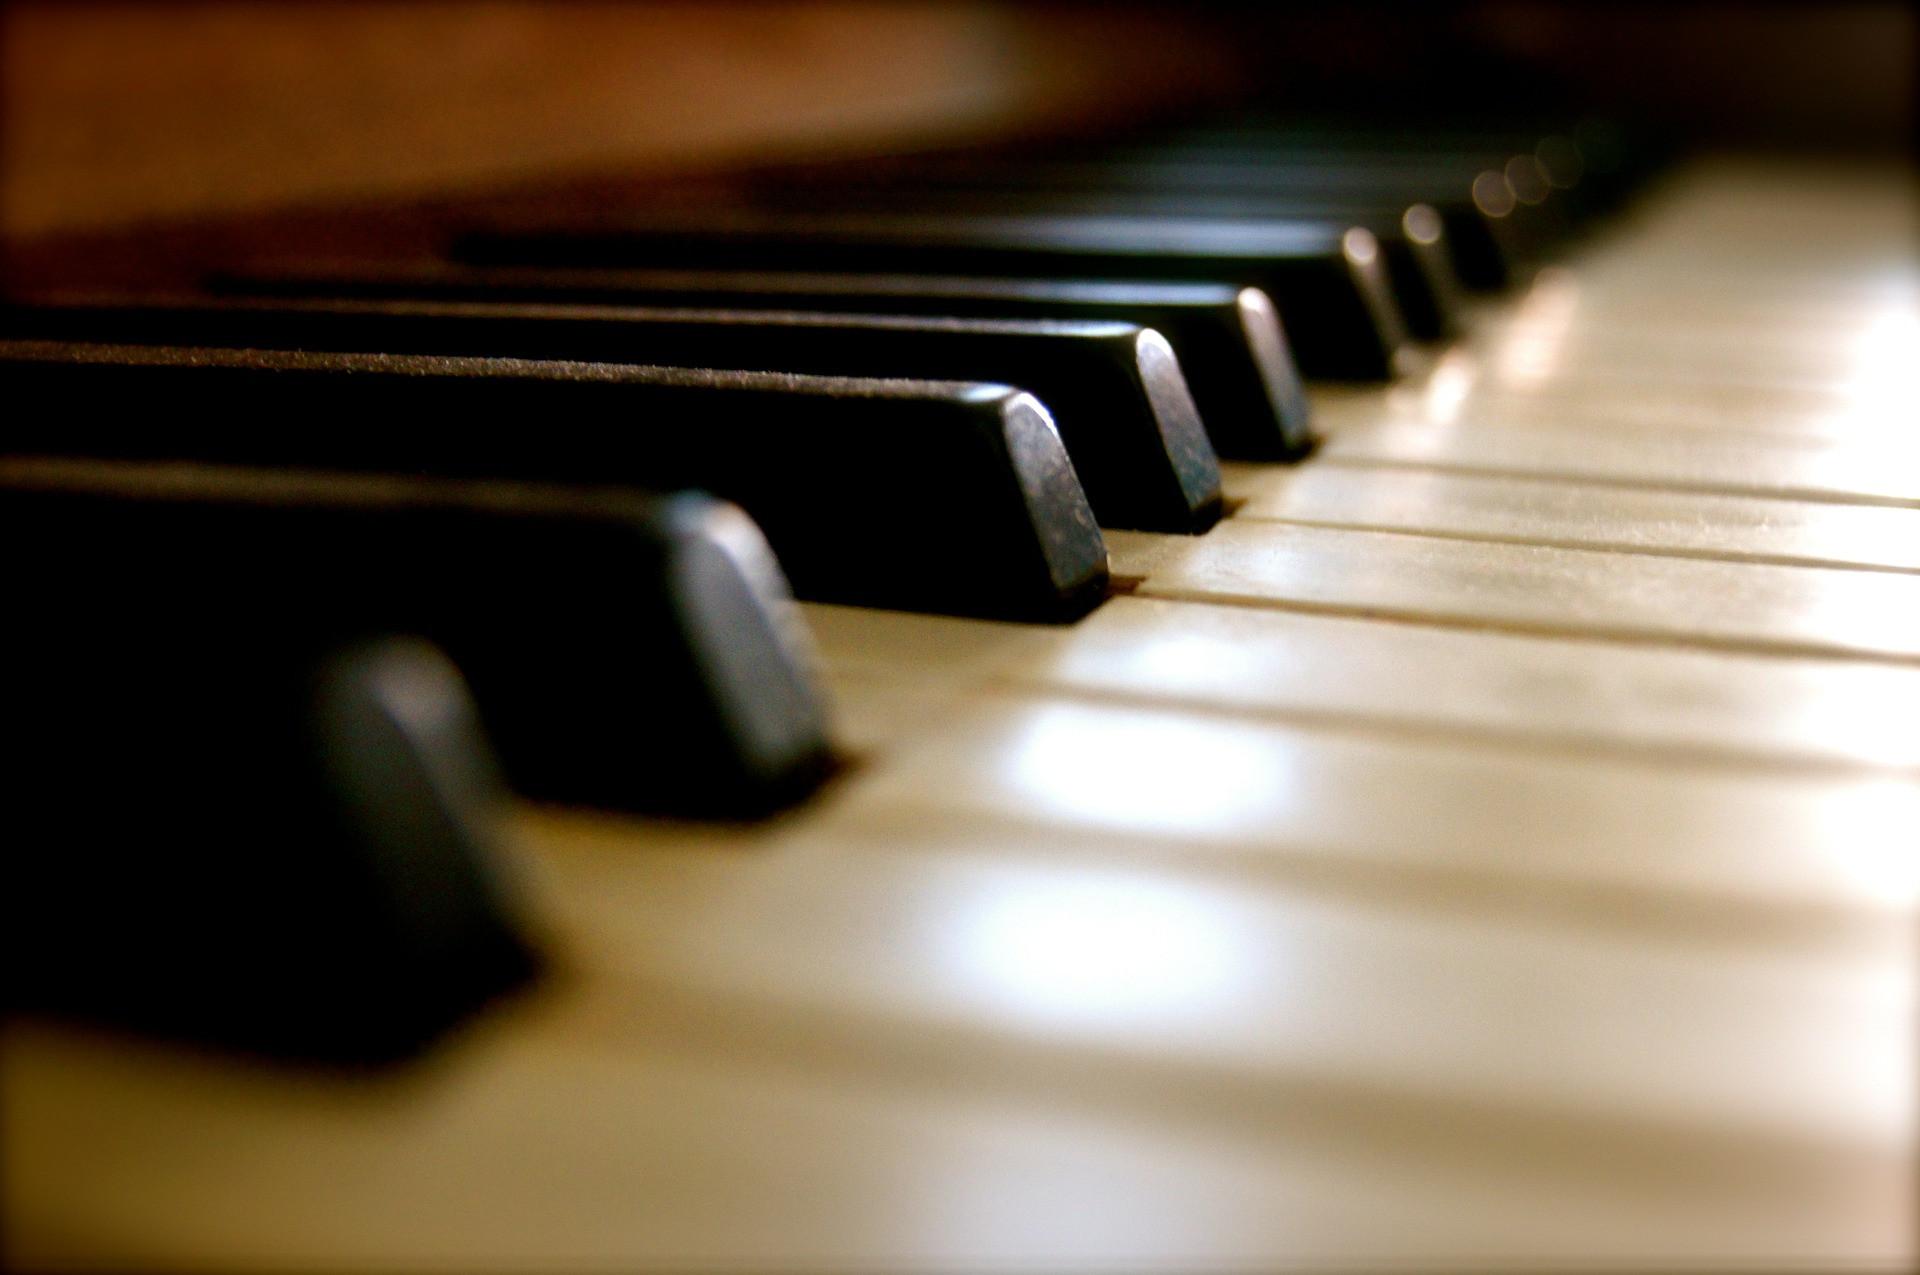 Wiener Klavierabend / Piano evening